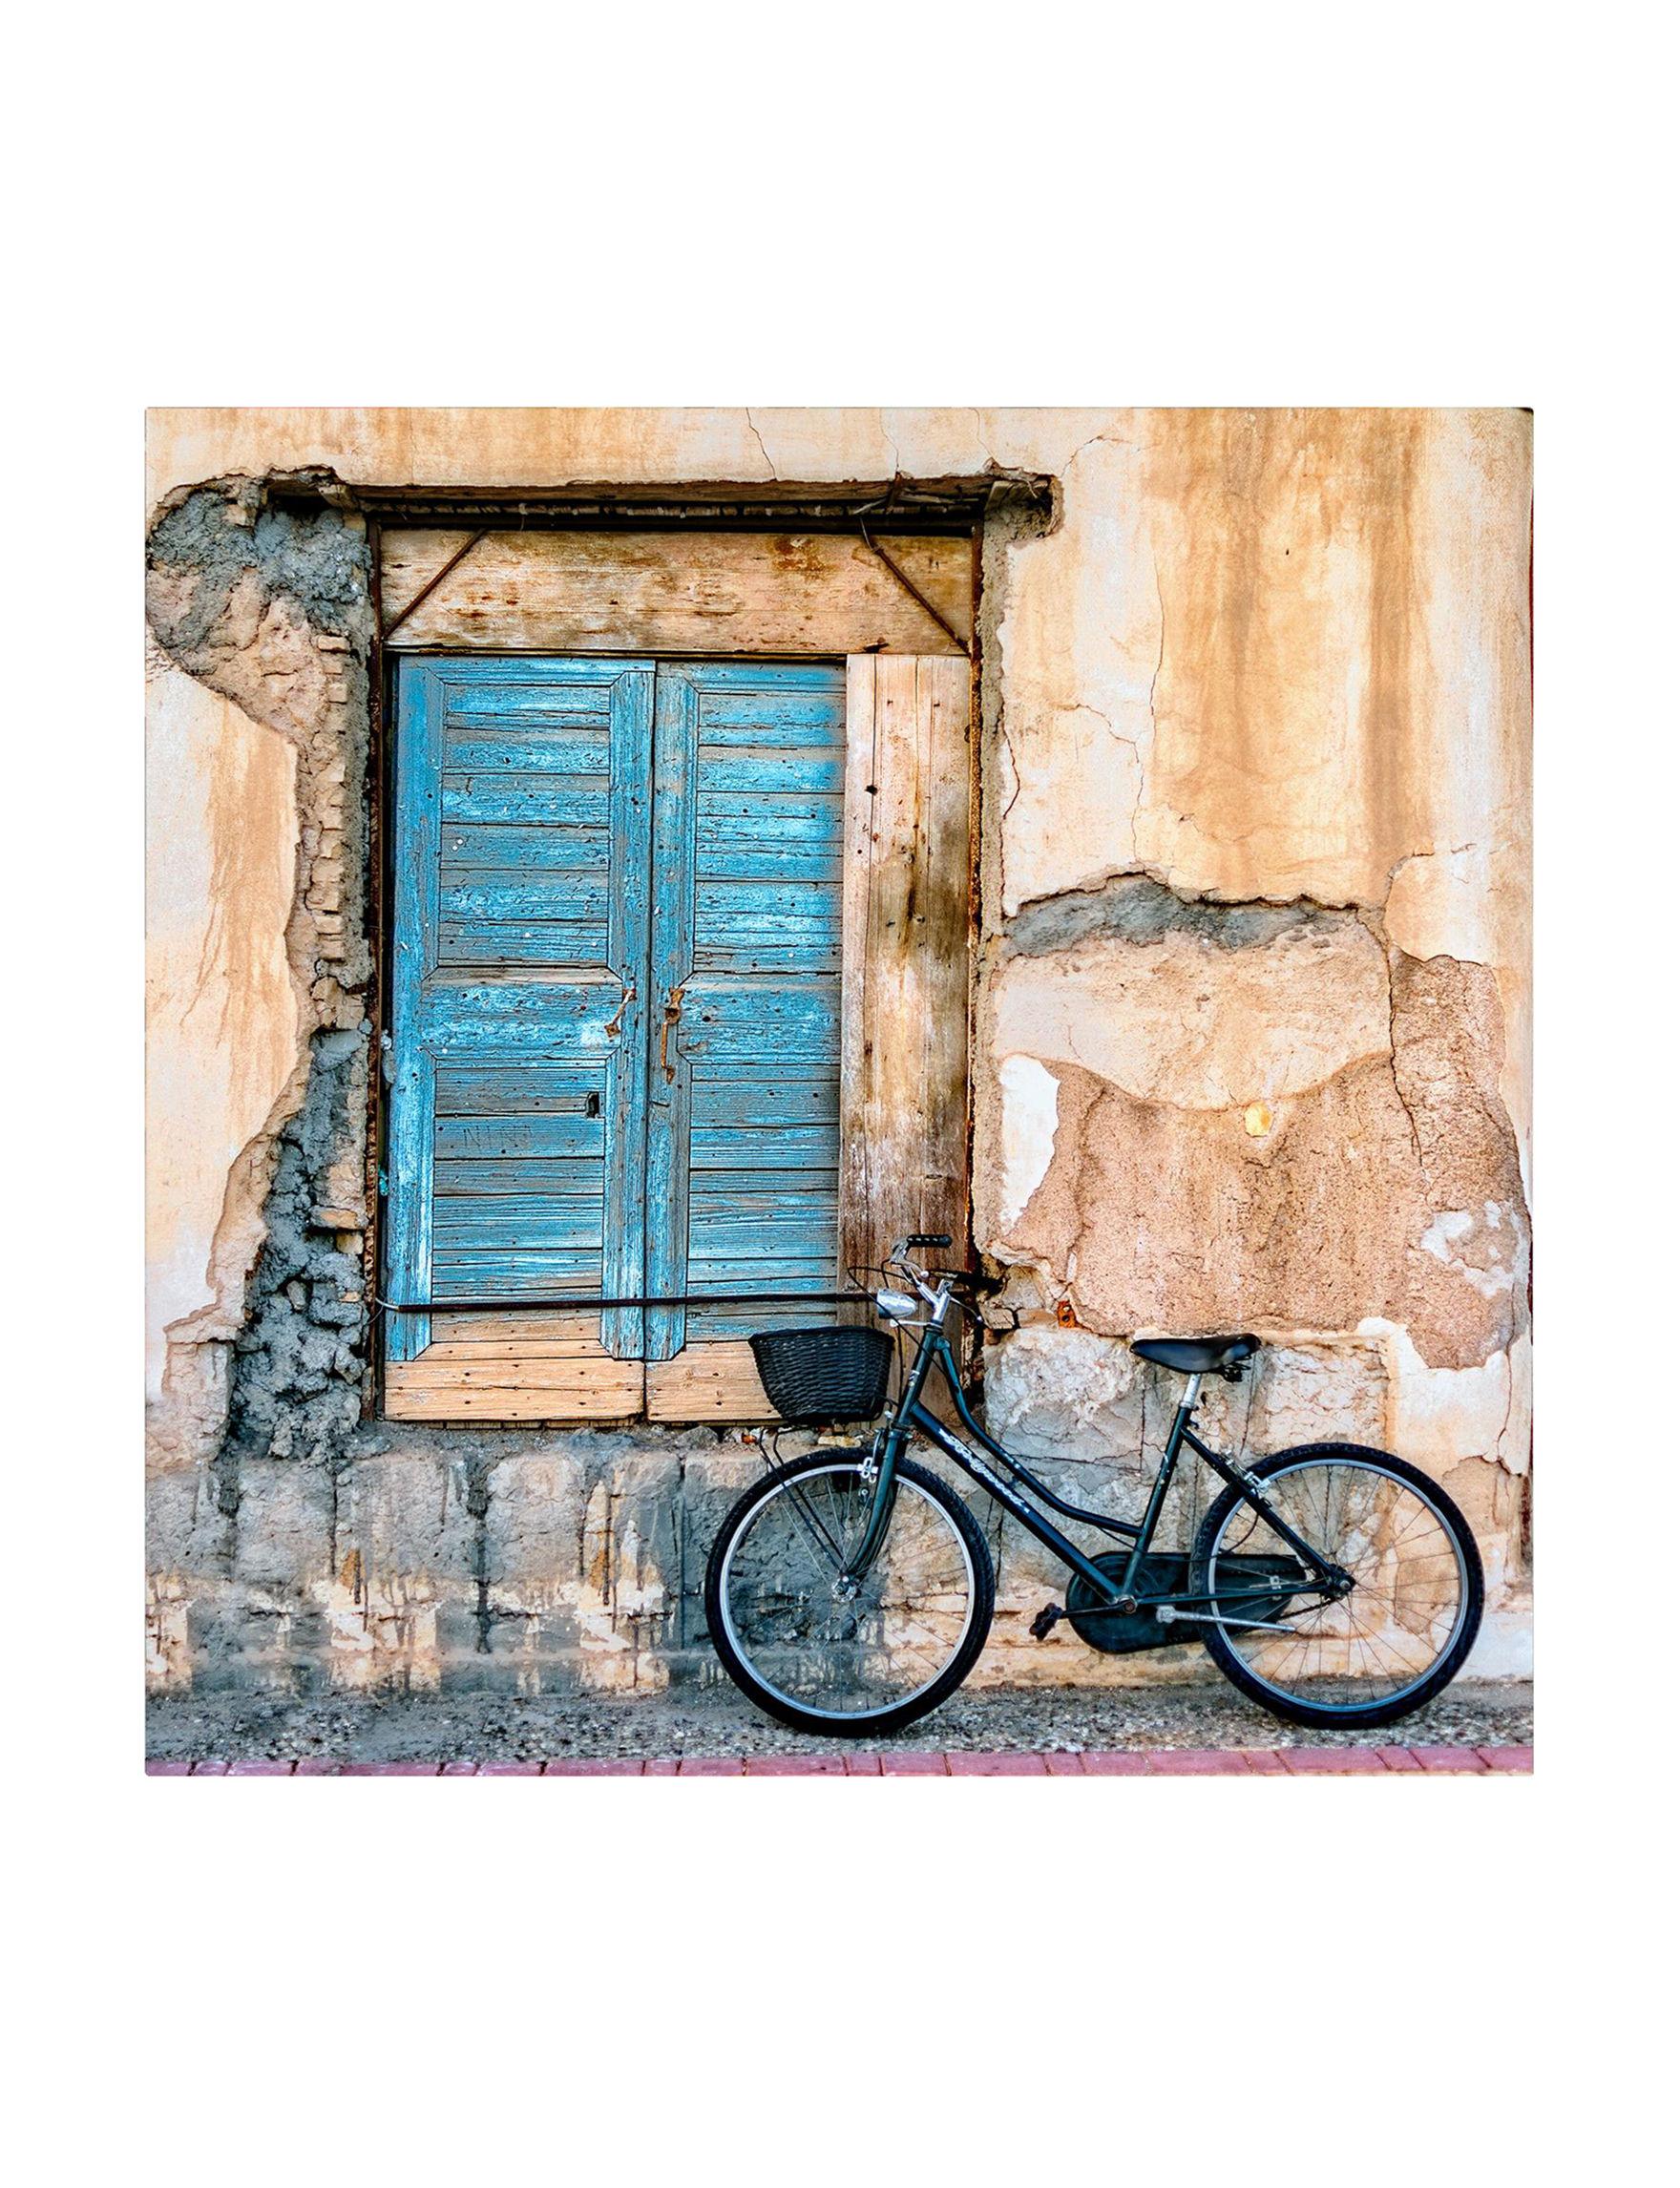 Trademark Fine Art Beige / Blue Wall Art Wall Decor